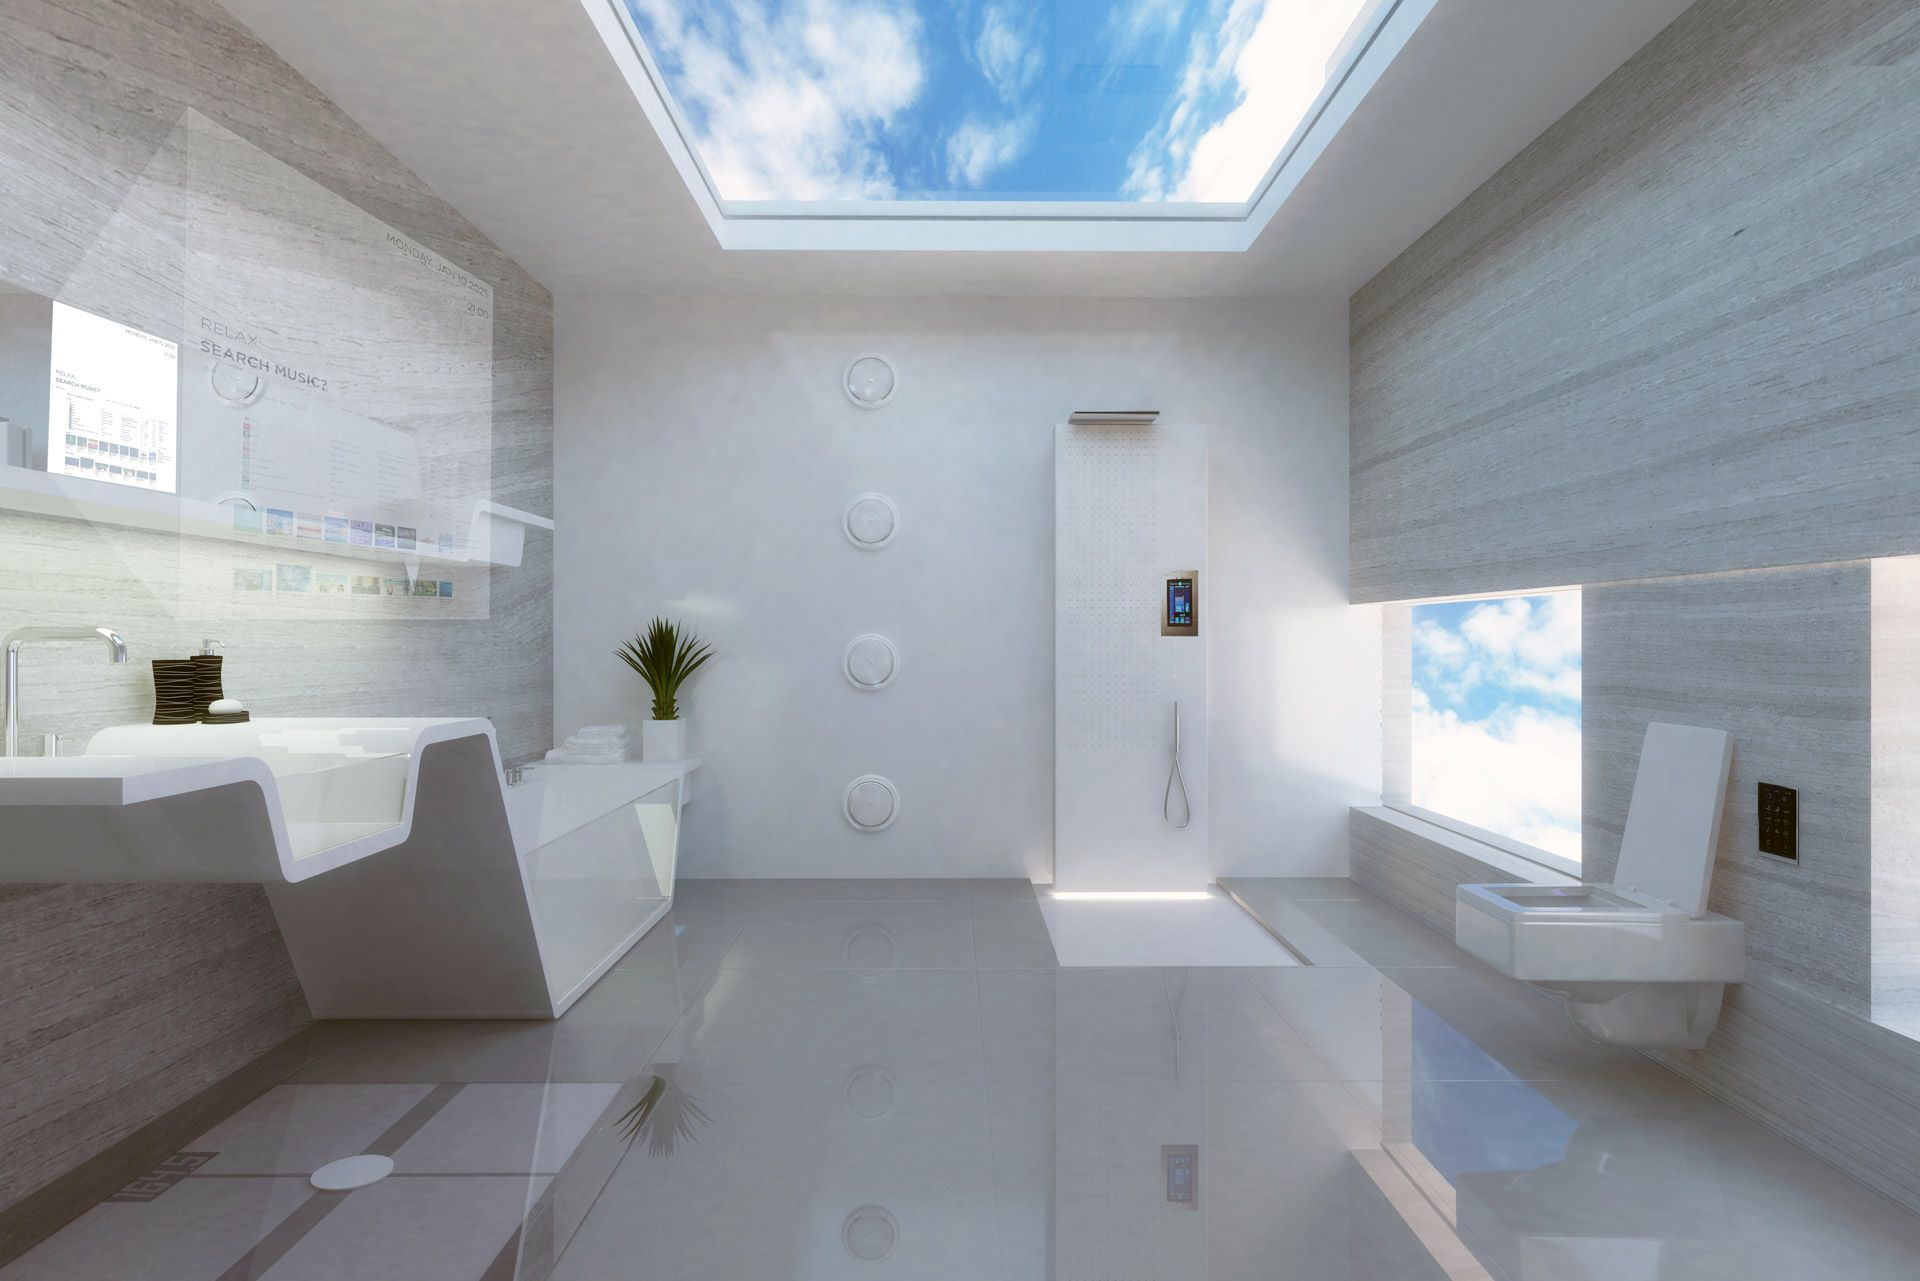 Pin by Juth Mac on Future Bathroom | Pinterest | Future